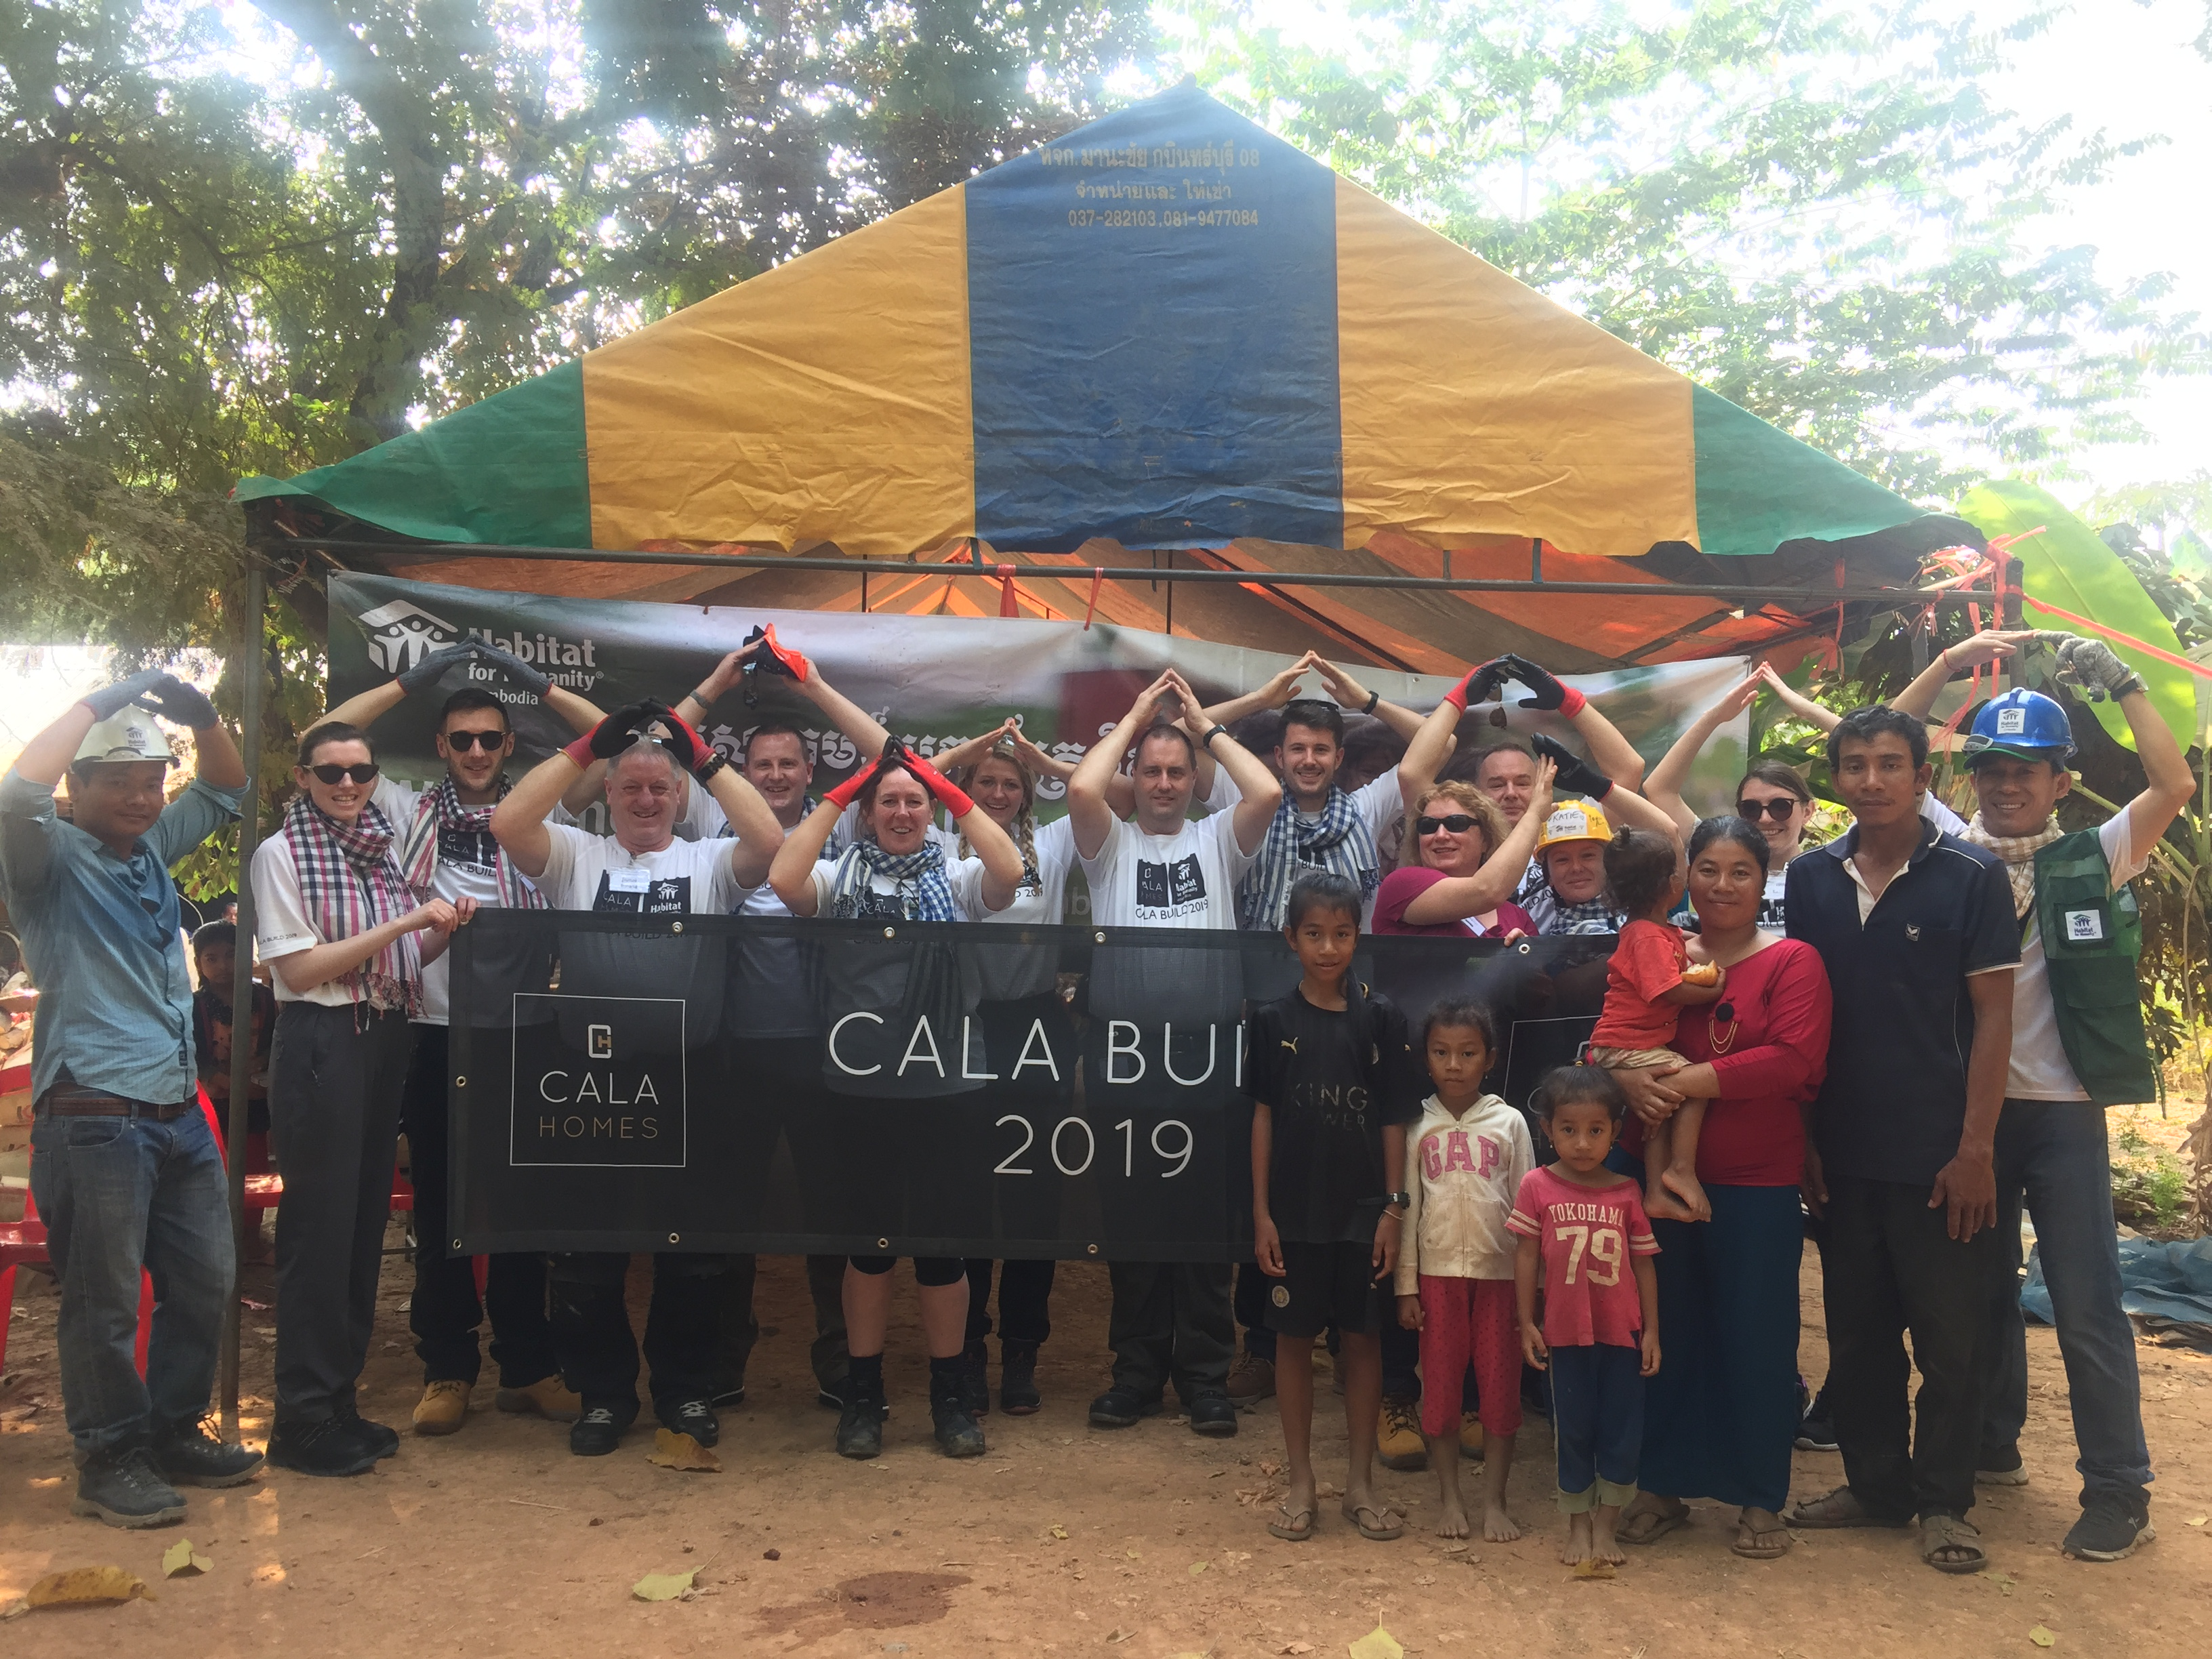 The team in Cambodia